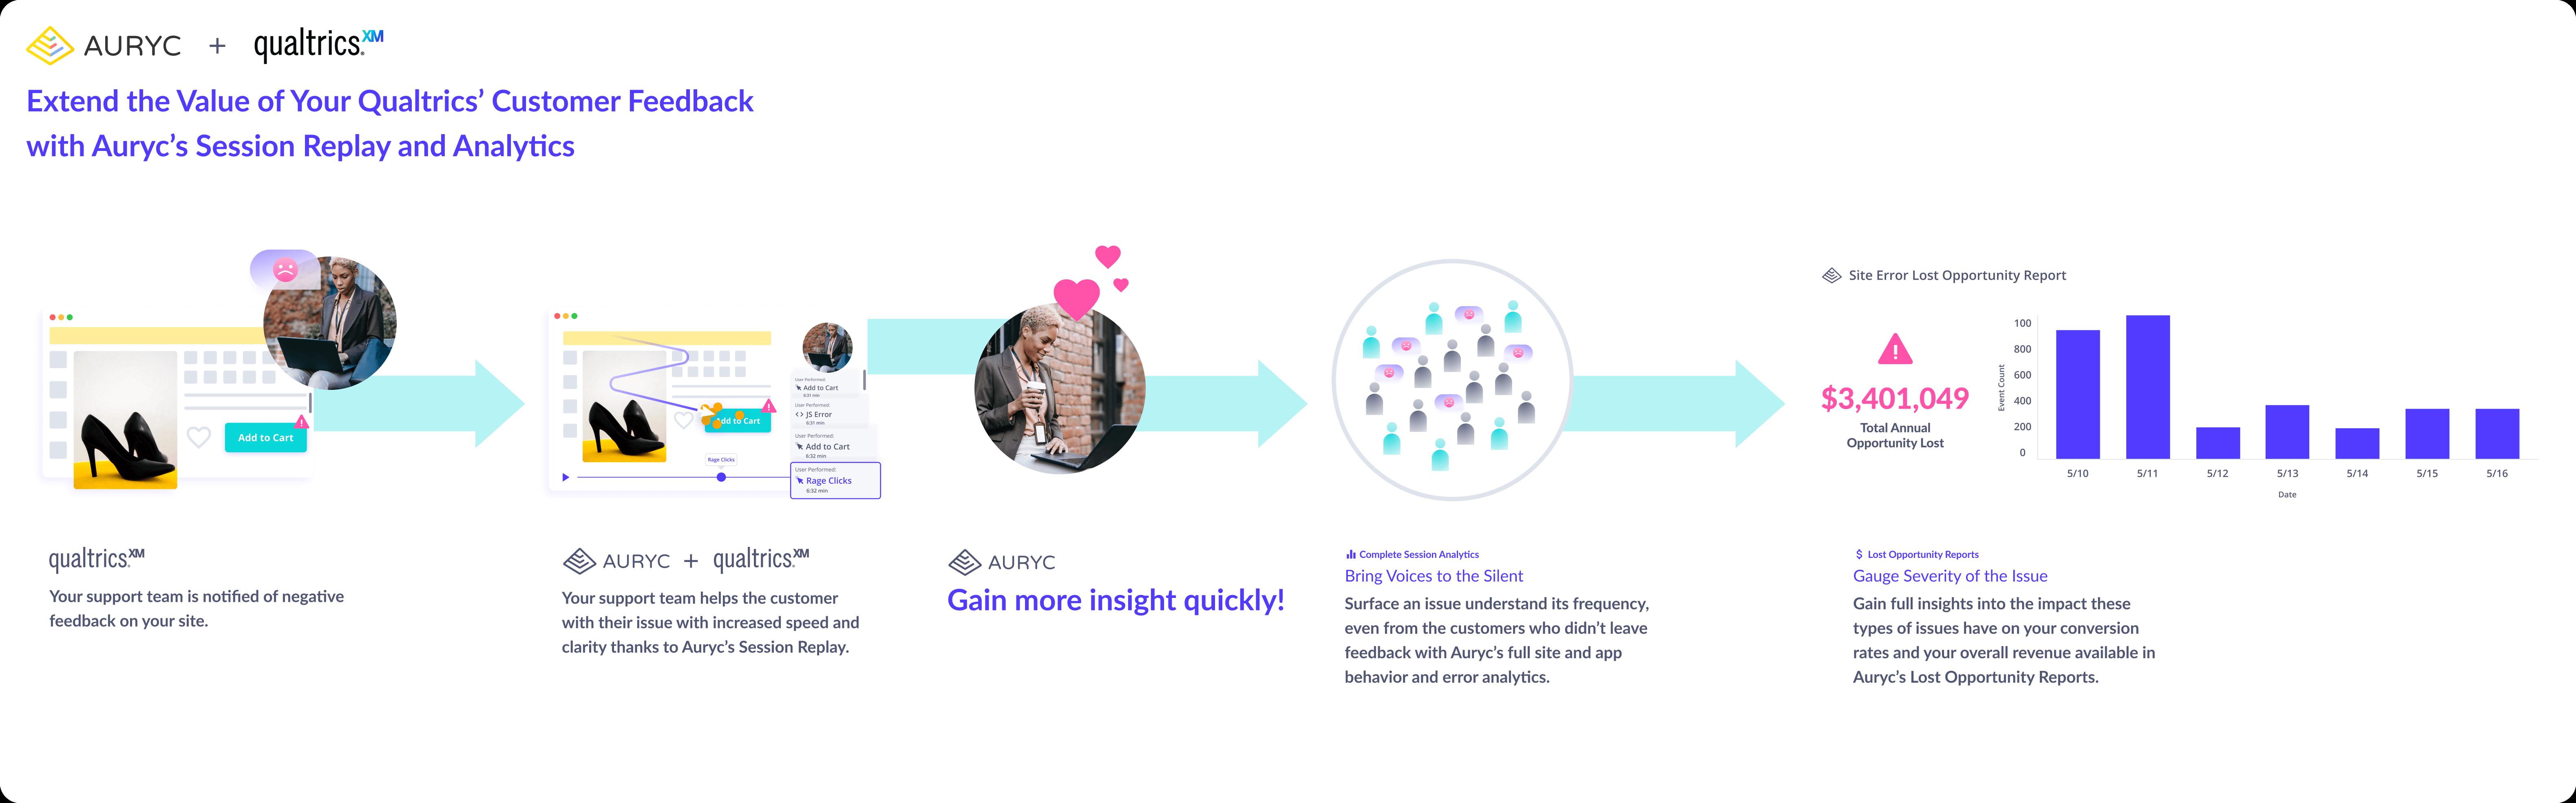 Auryc Customer Experience Platform Integrates with Quatrics Customer Feedback - how it works